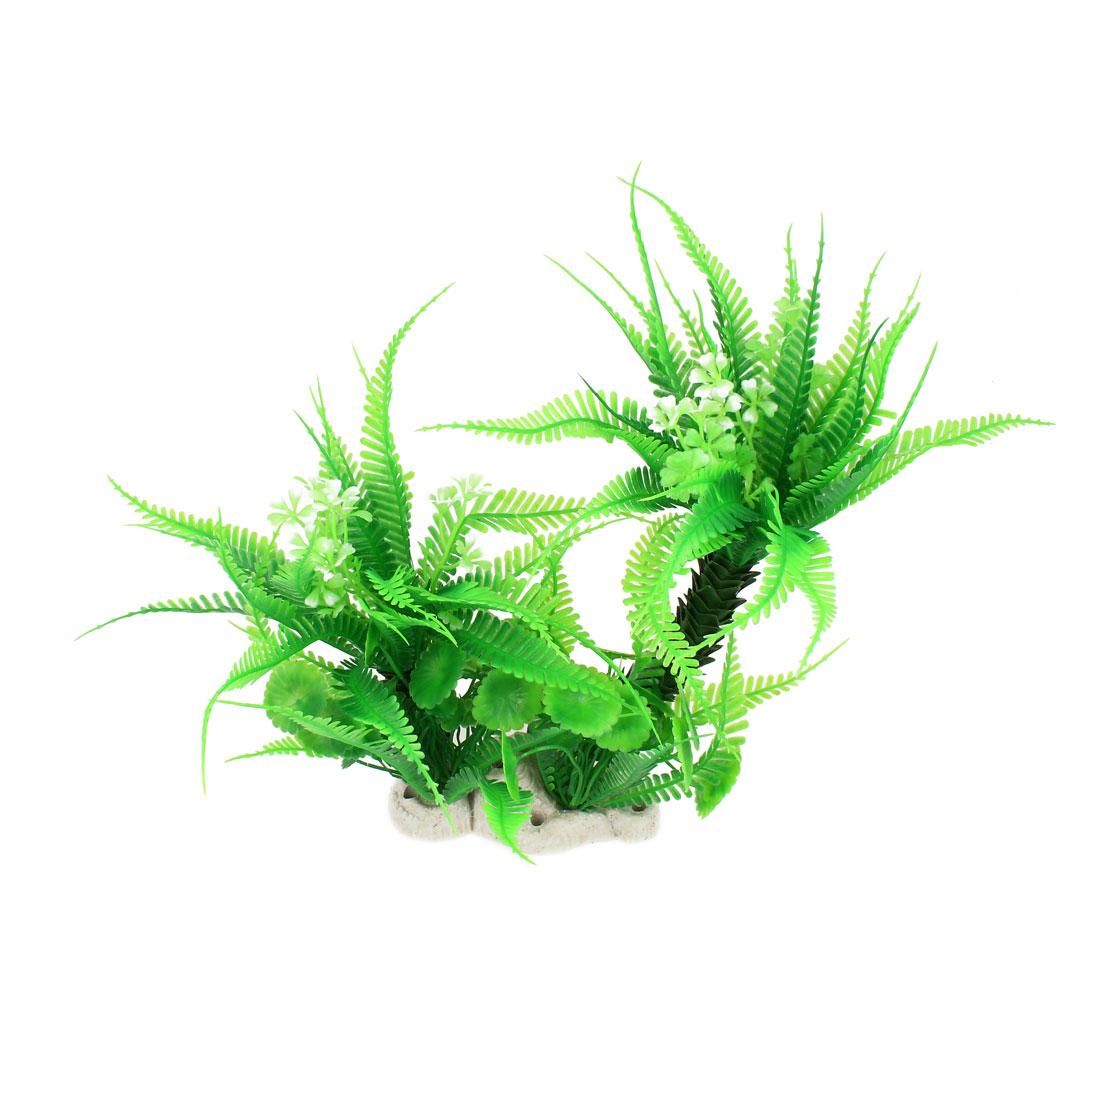 "Fish Tank Decoration 11.8"" Height Coconut Tree Underwater Aquarium Plant Grass Green"